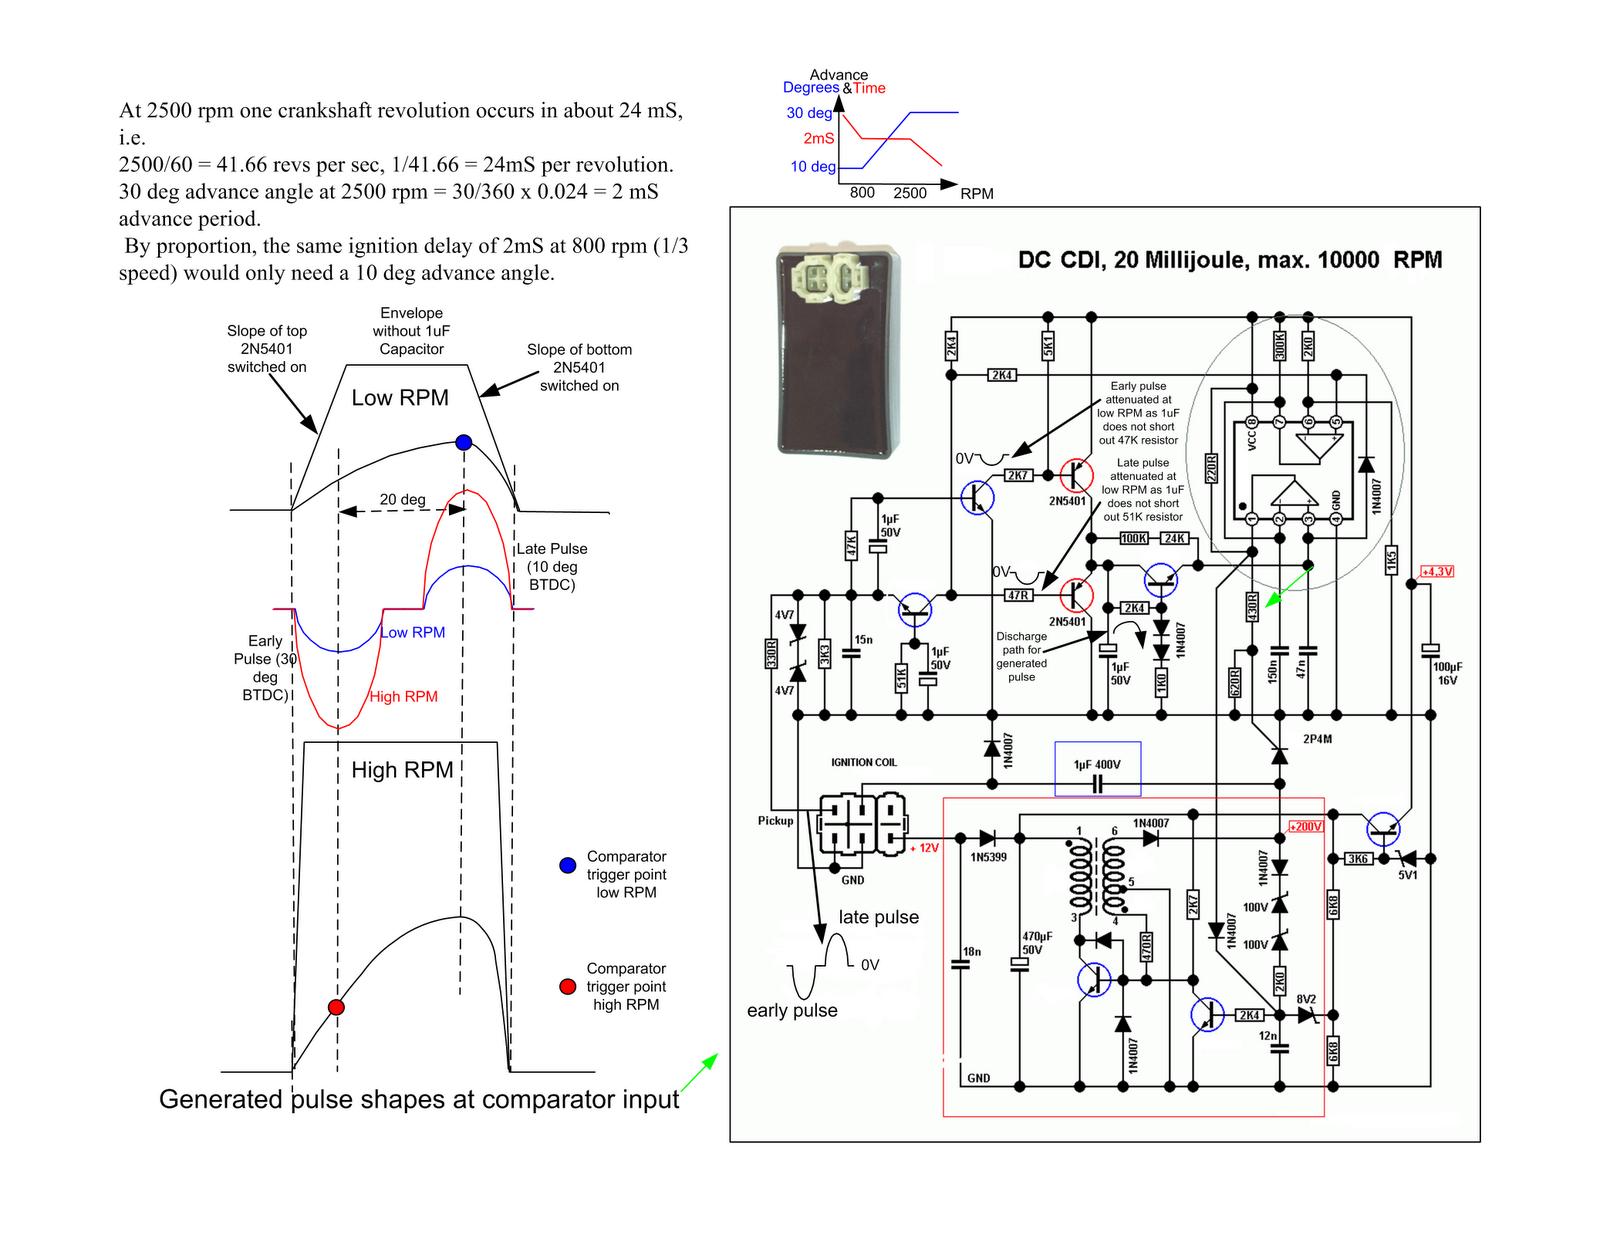 Dc Cdi Schematic Updated Dengan Gambar